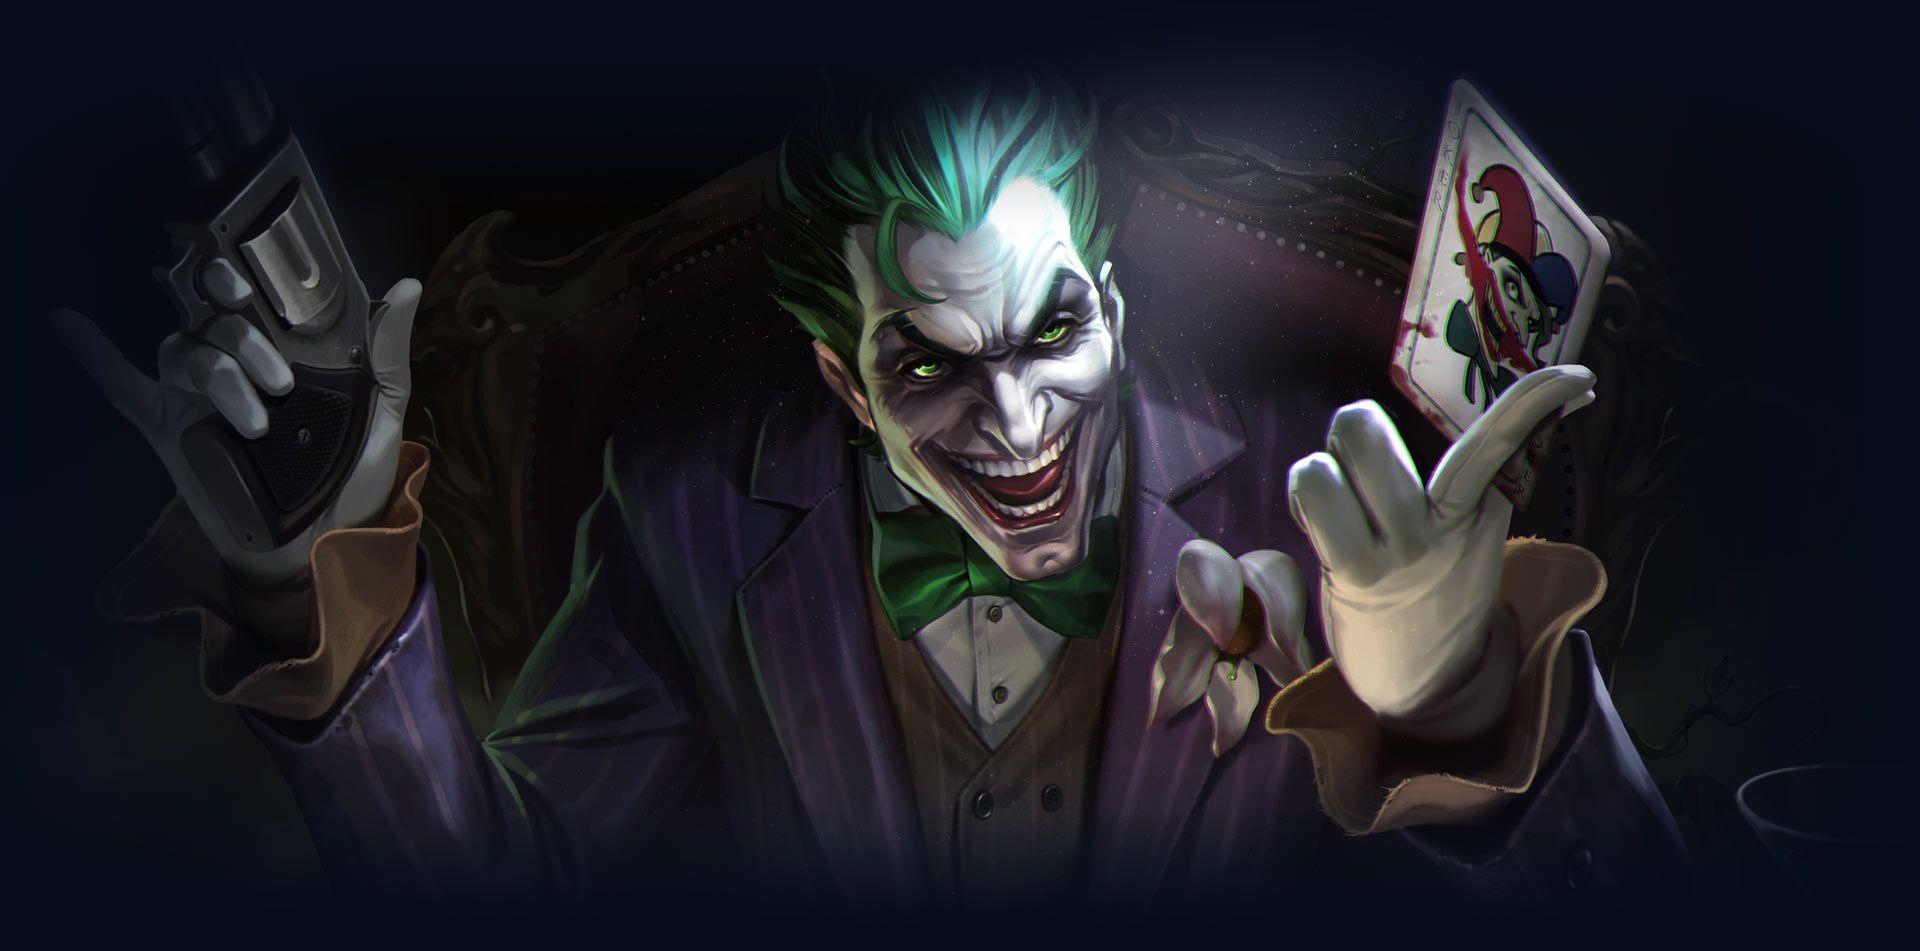 Hình nền Joker